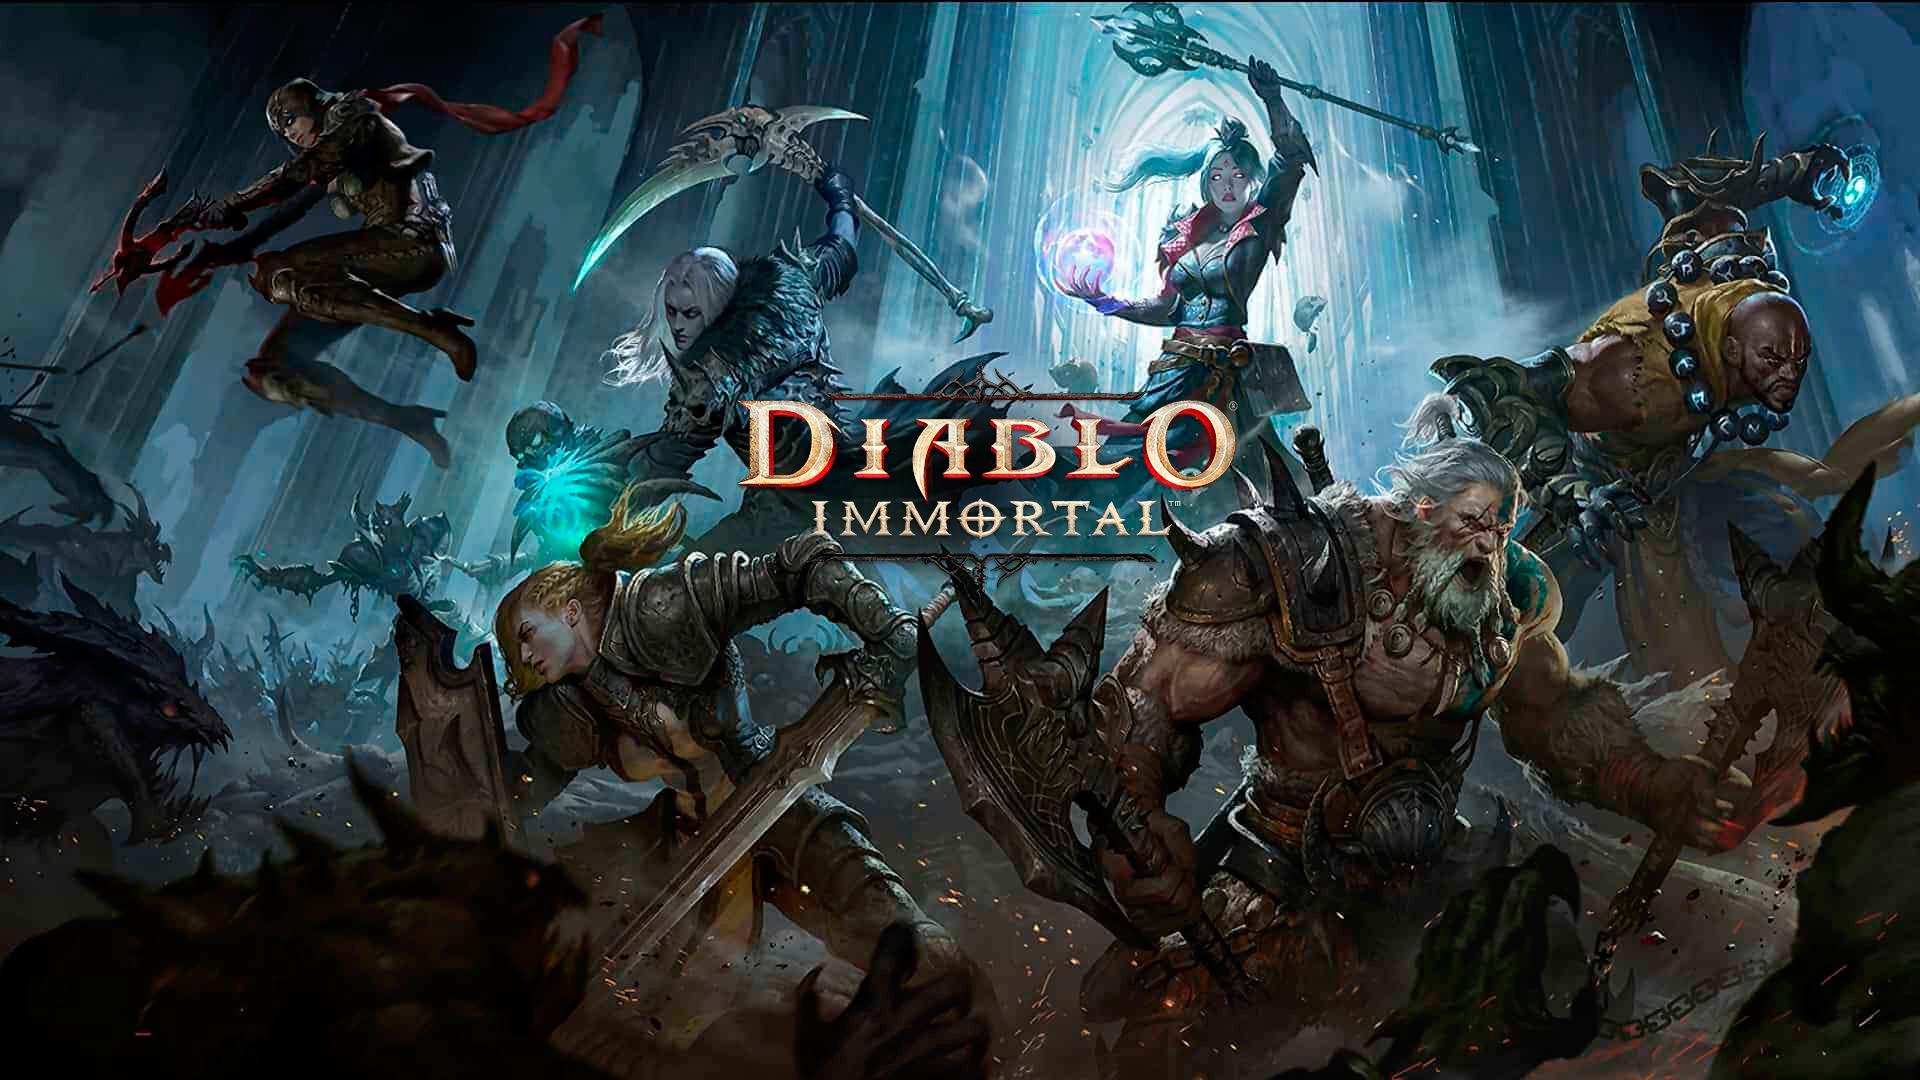 Diablo Immortal Portada